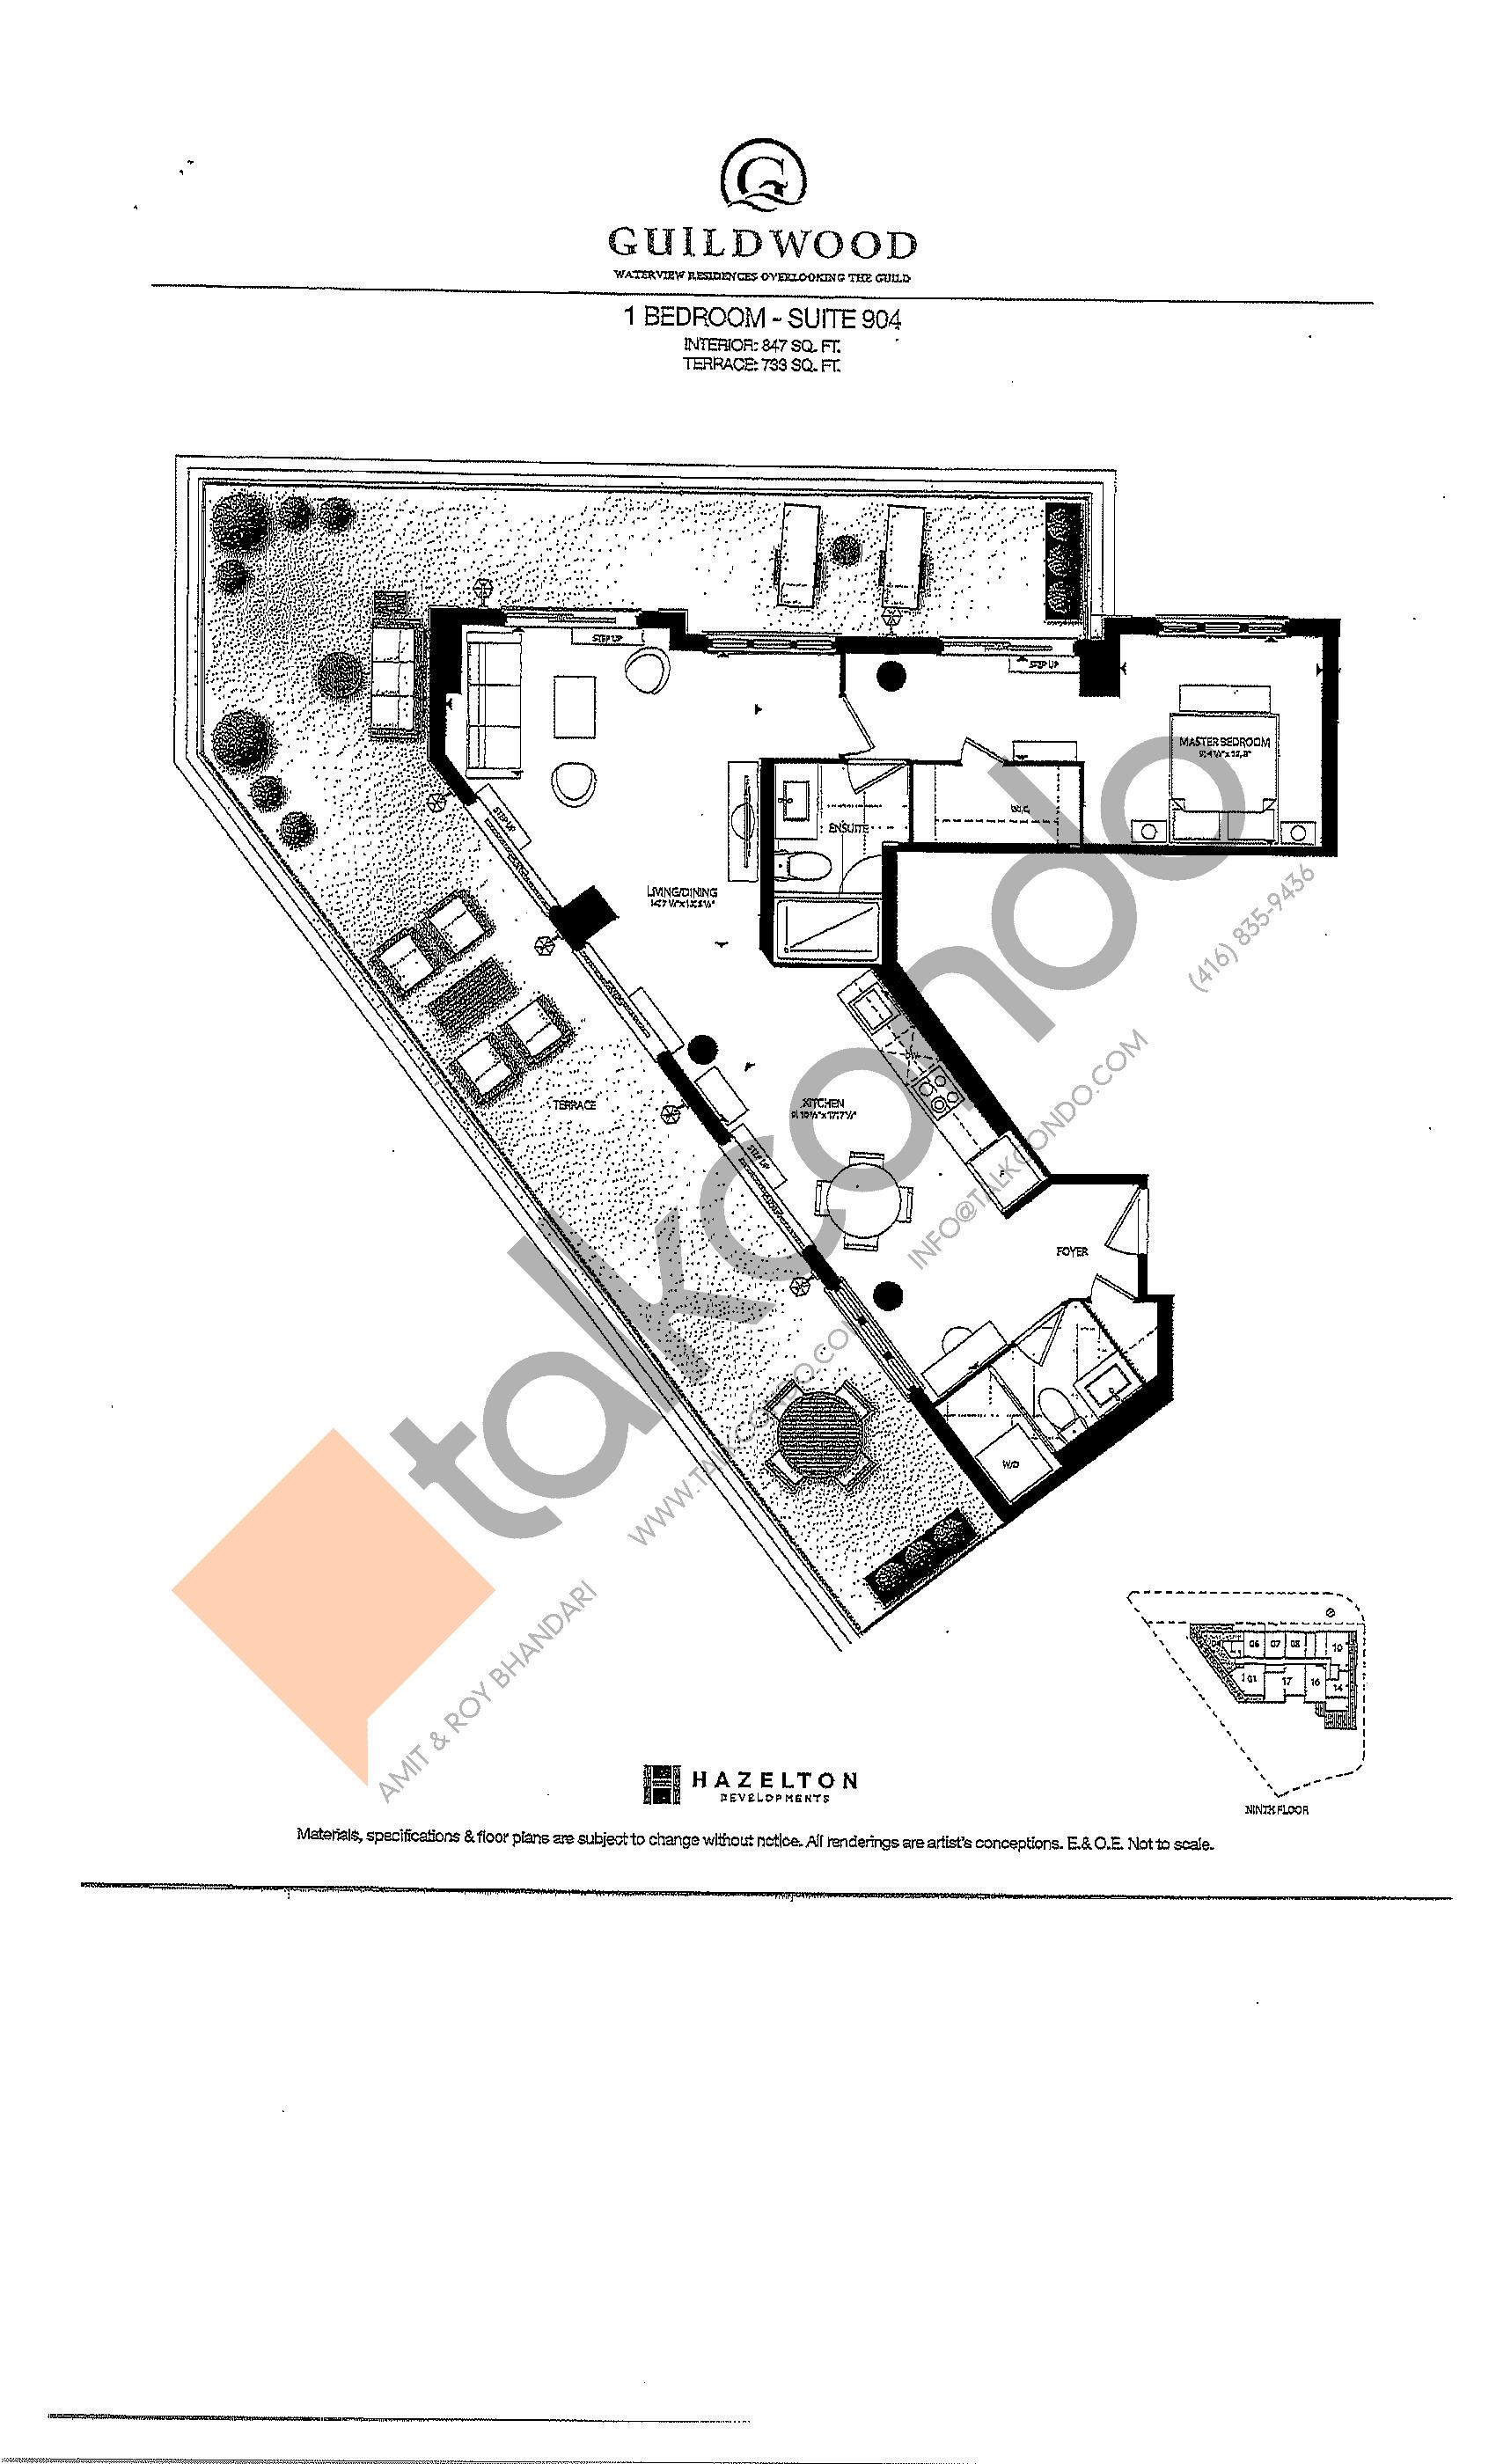 Suite 904 Floor Plan at Guildwood Condos - 847 sq.ft